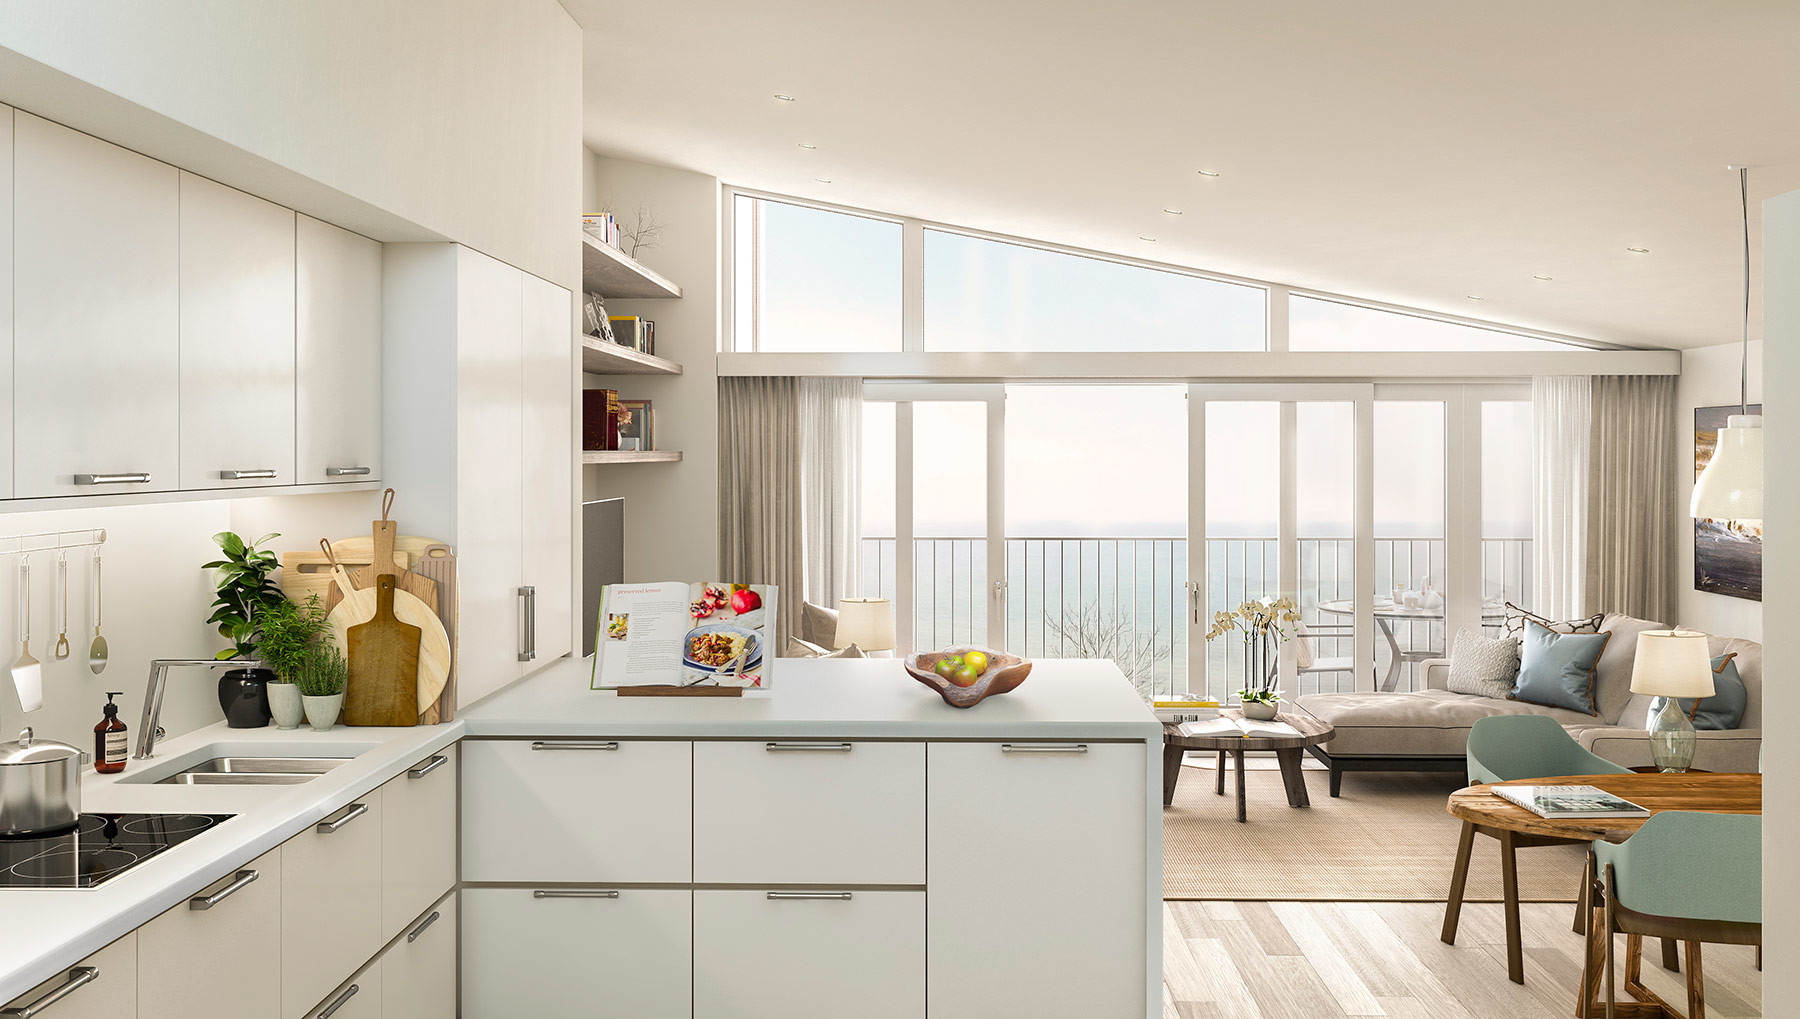 Sarah-Wigglesworth-Architects Shell-Cove-OC Kitchen 1800